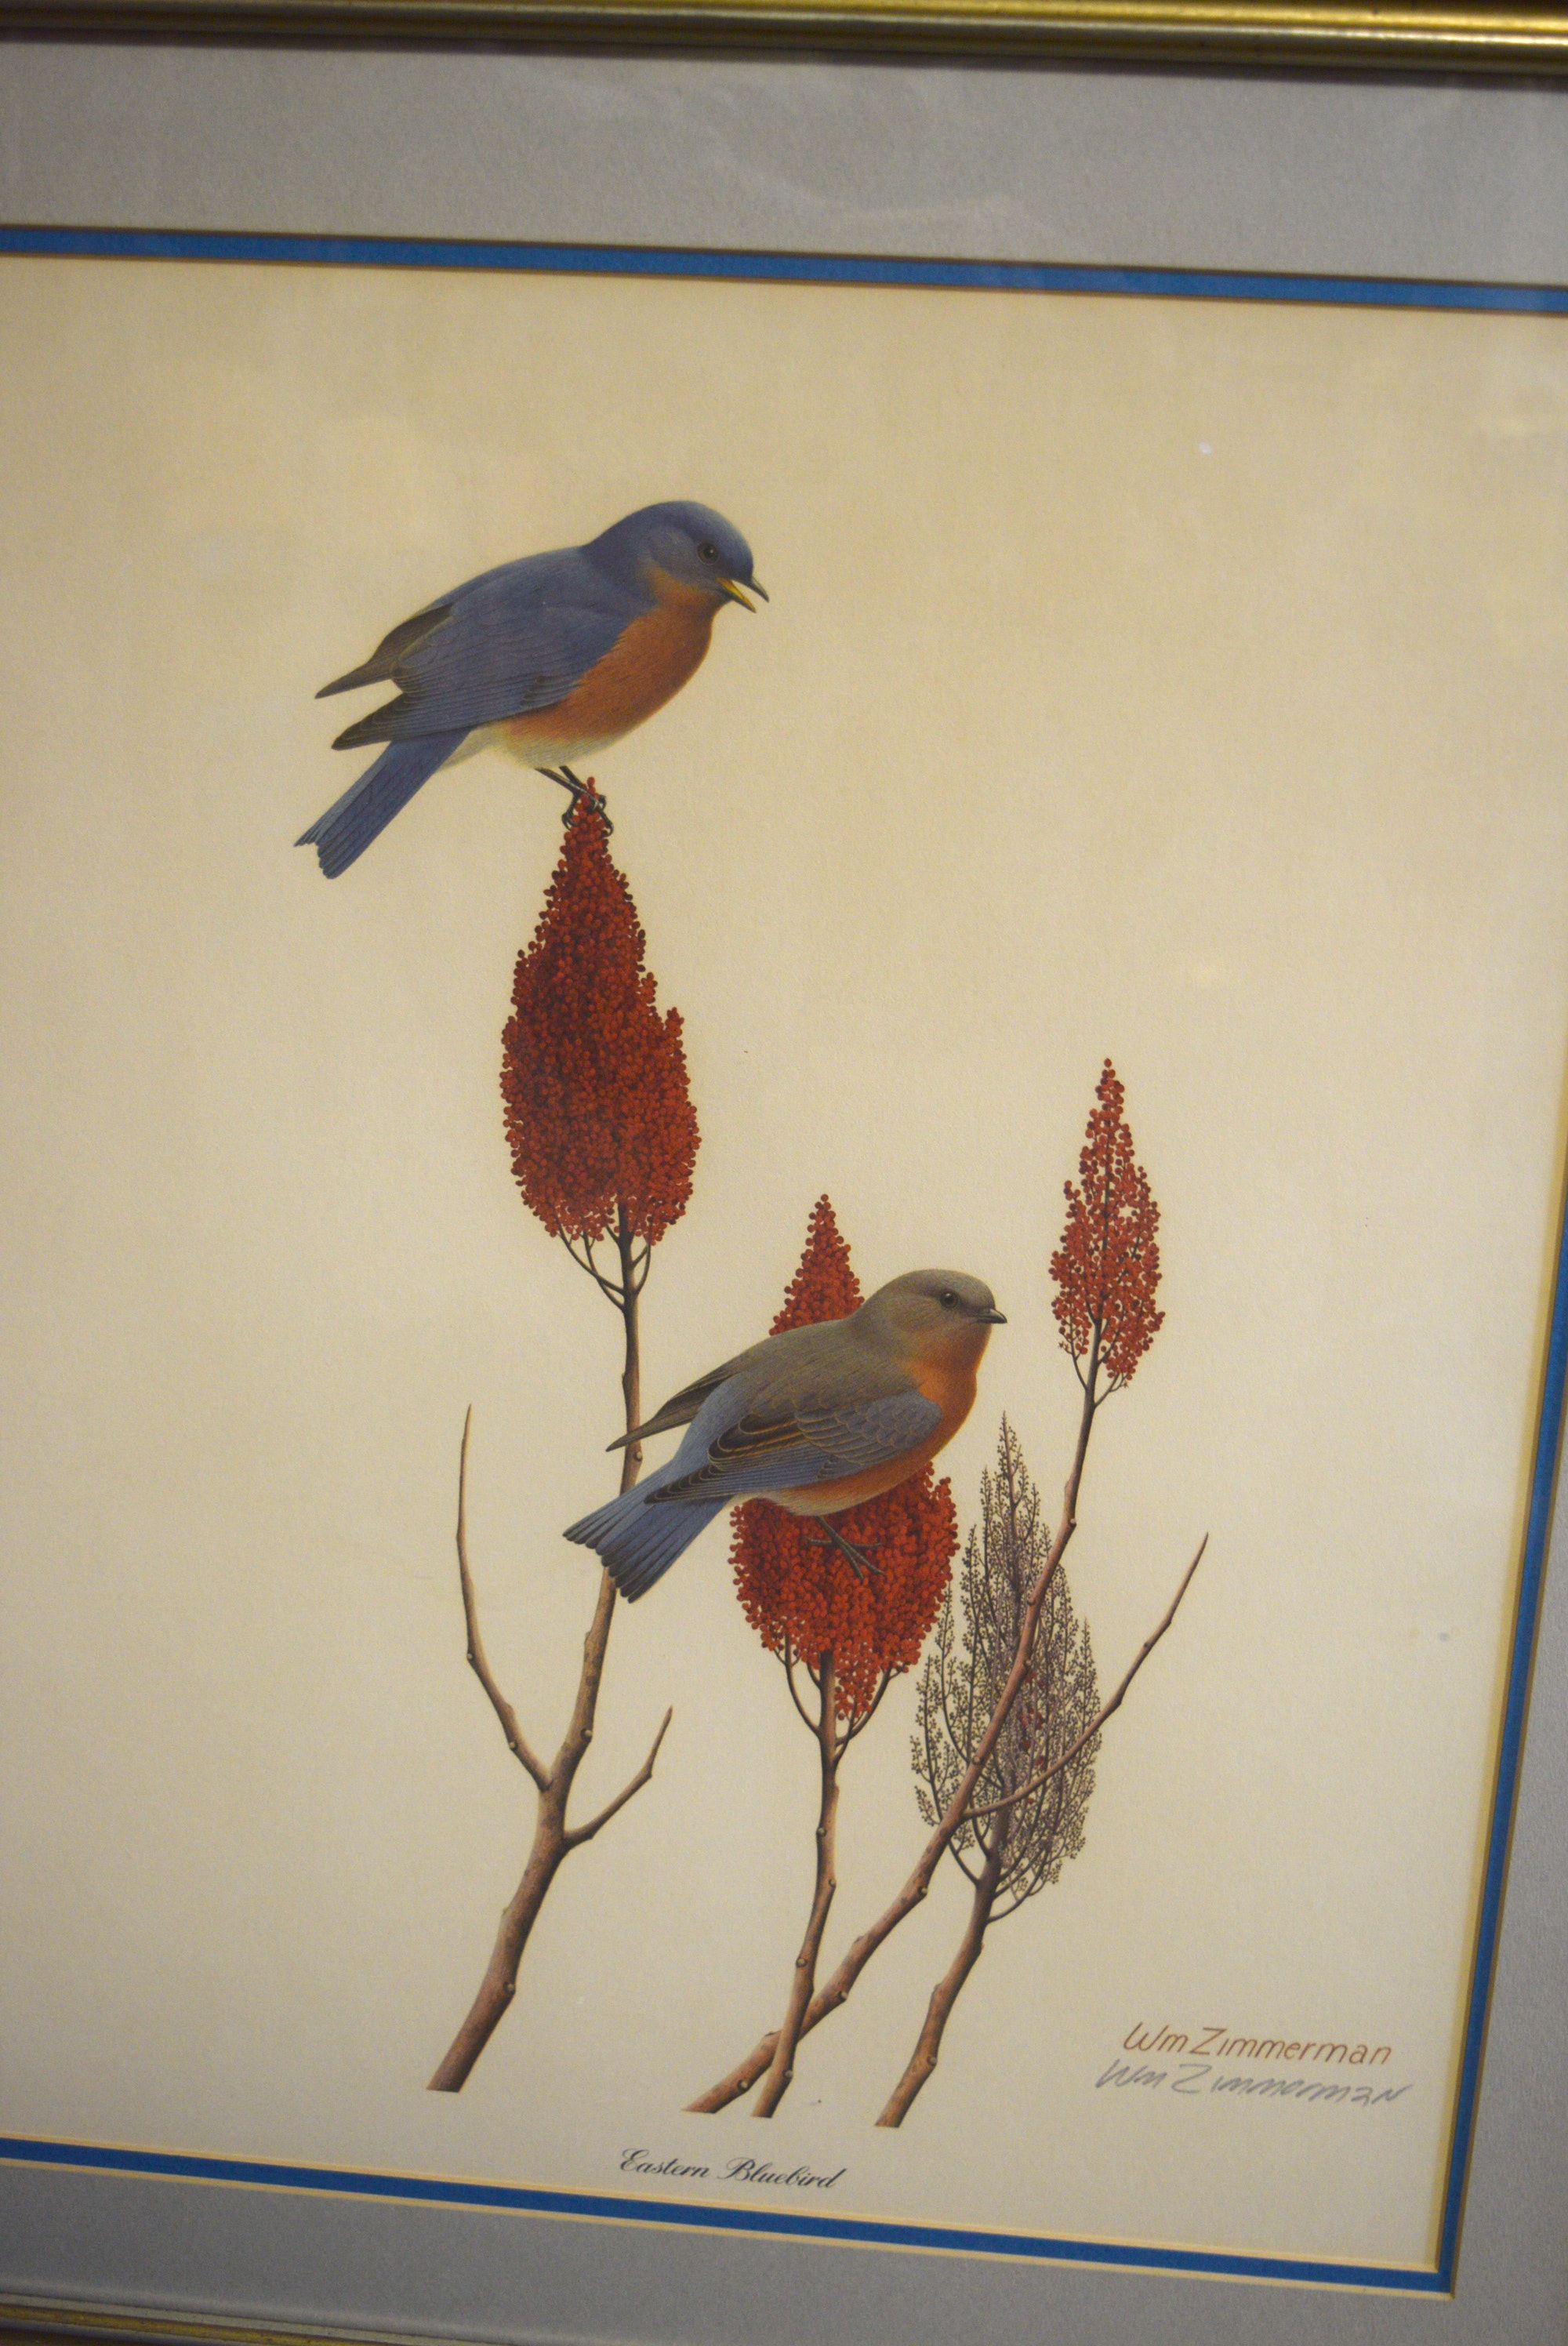 William Zimmerman Eastern Bluebird Lithograph Ebth